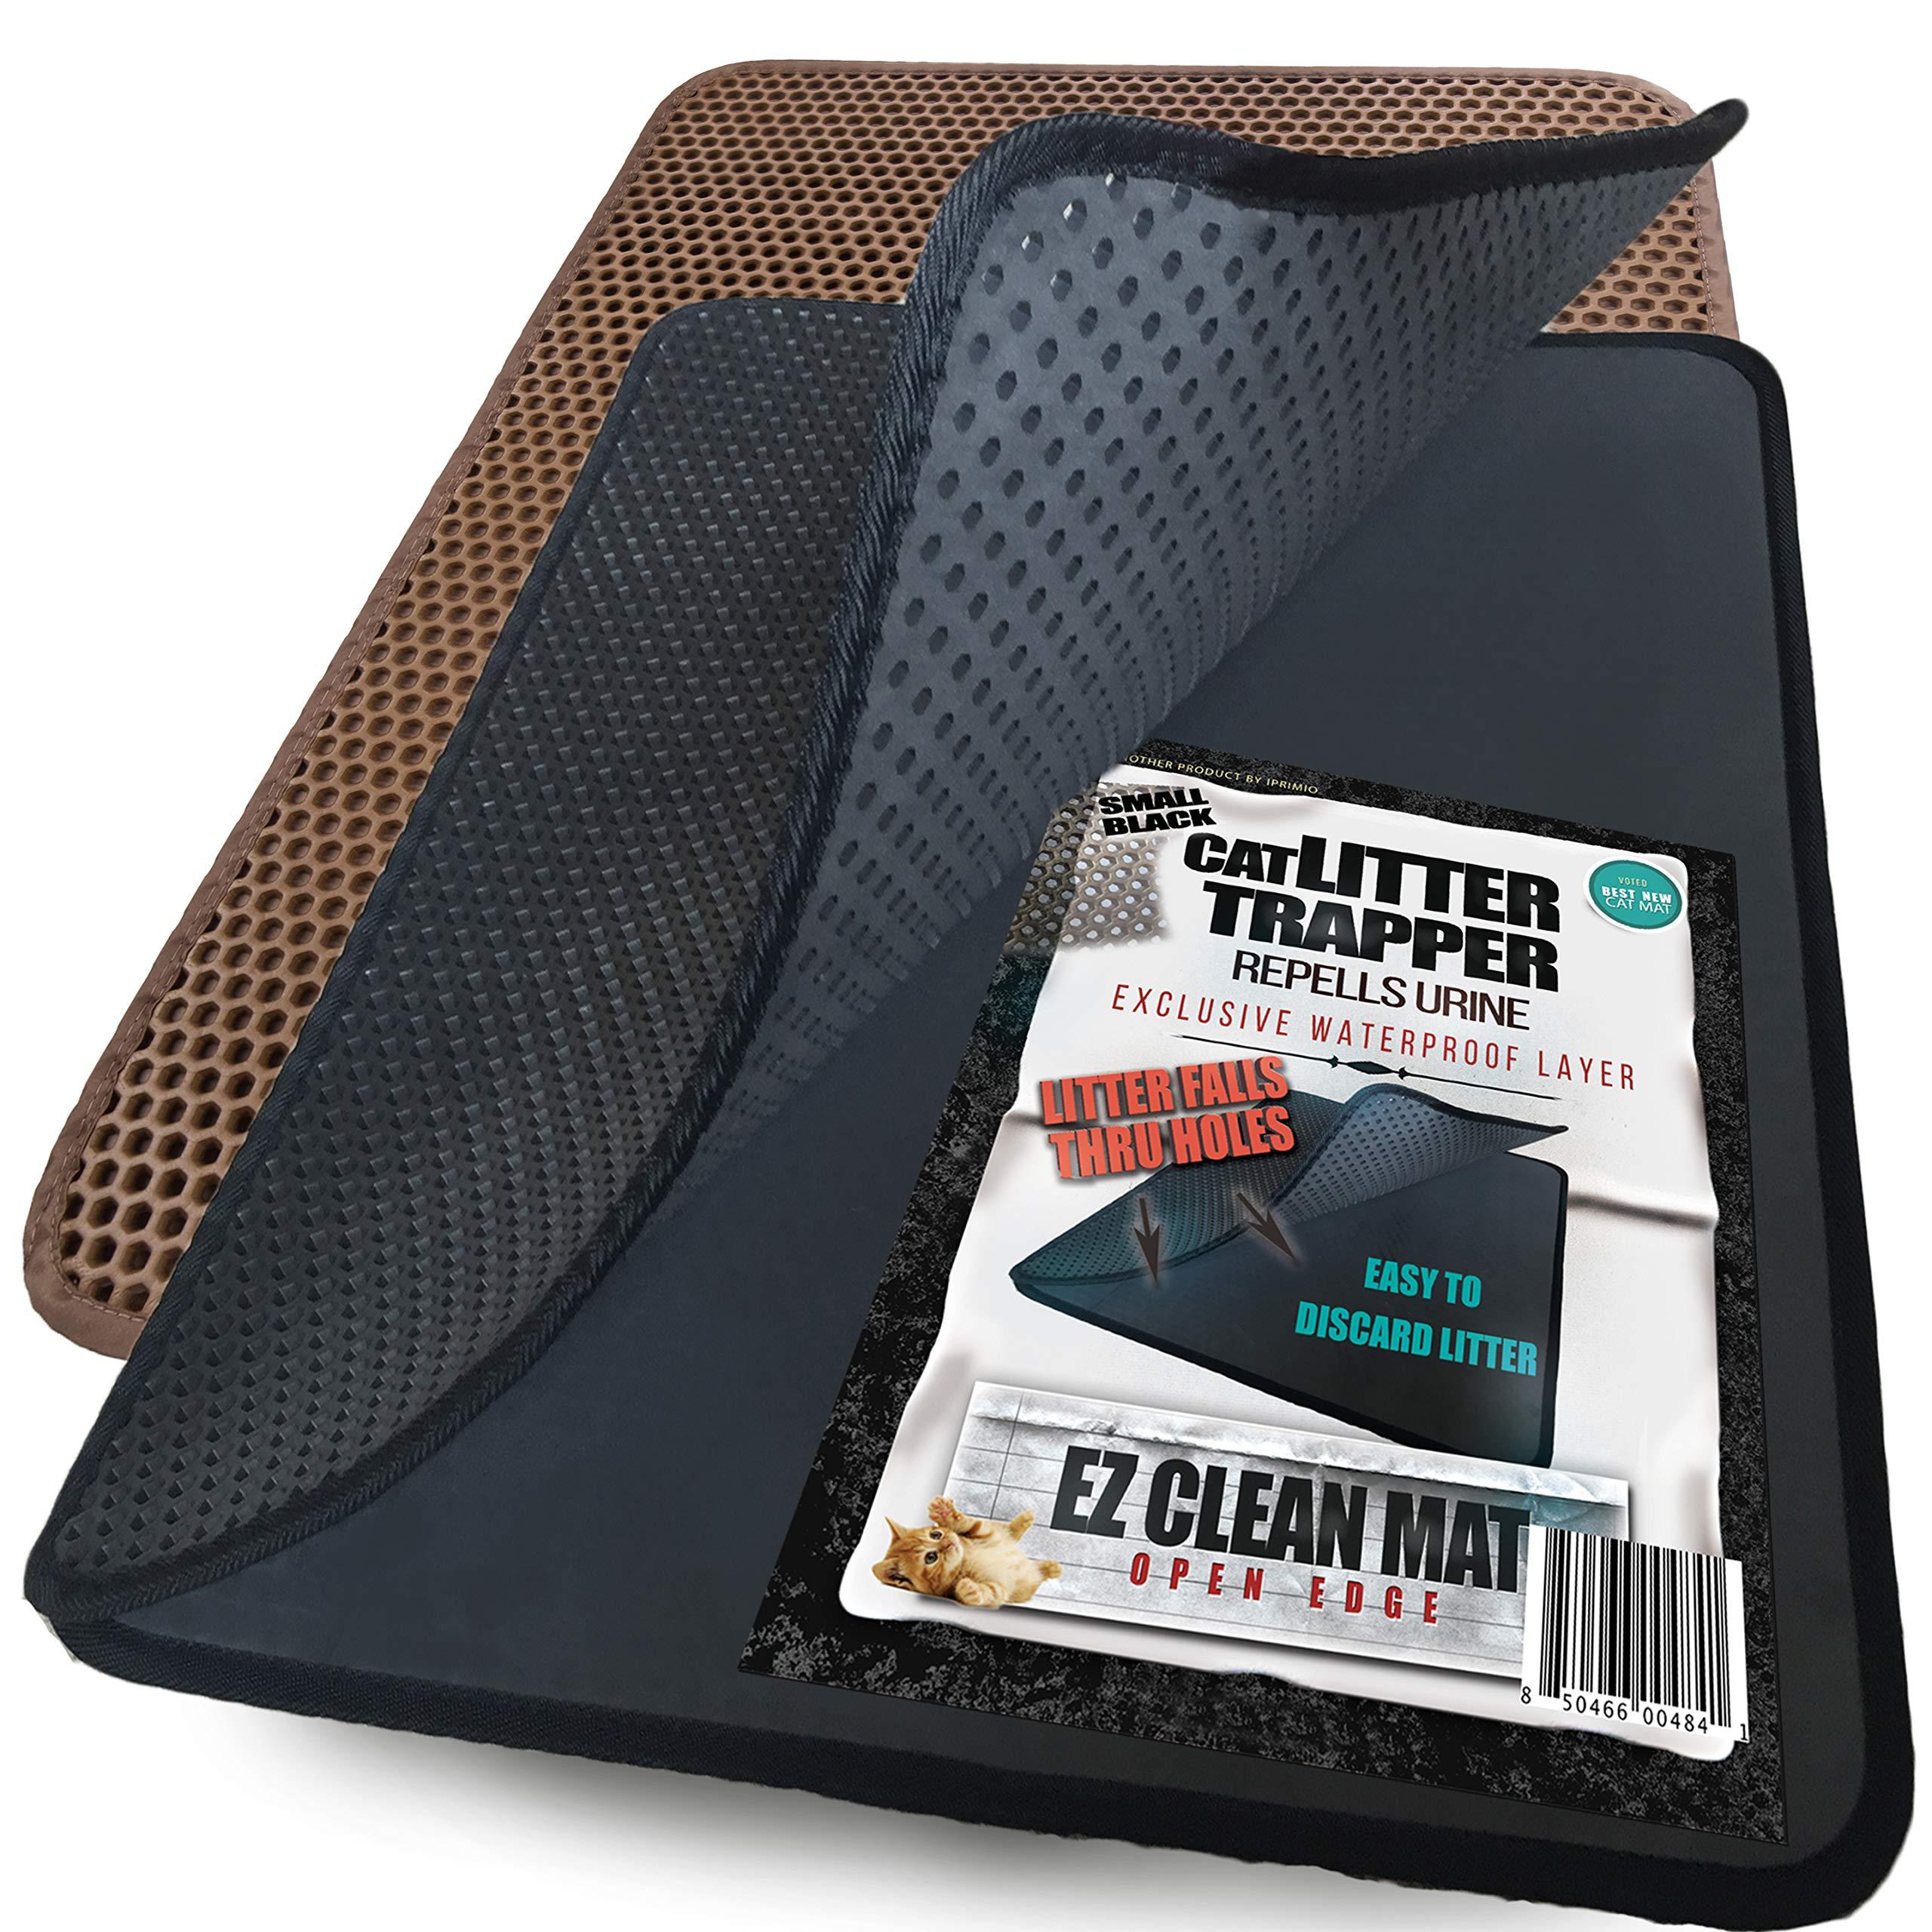 iPrimio Small Cat Litter Trapper Litter Mat, EZ Clean Cat Mat, Litter Box Mat Water Proof Layer and Puppy Pad Option. Patent Pending. (23''x21'' Black)